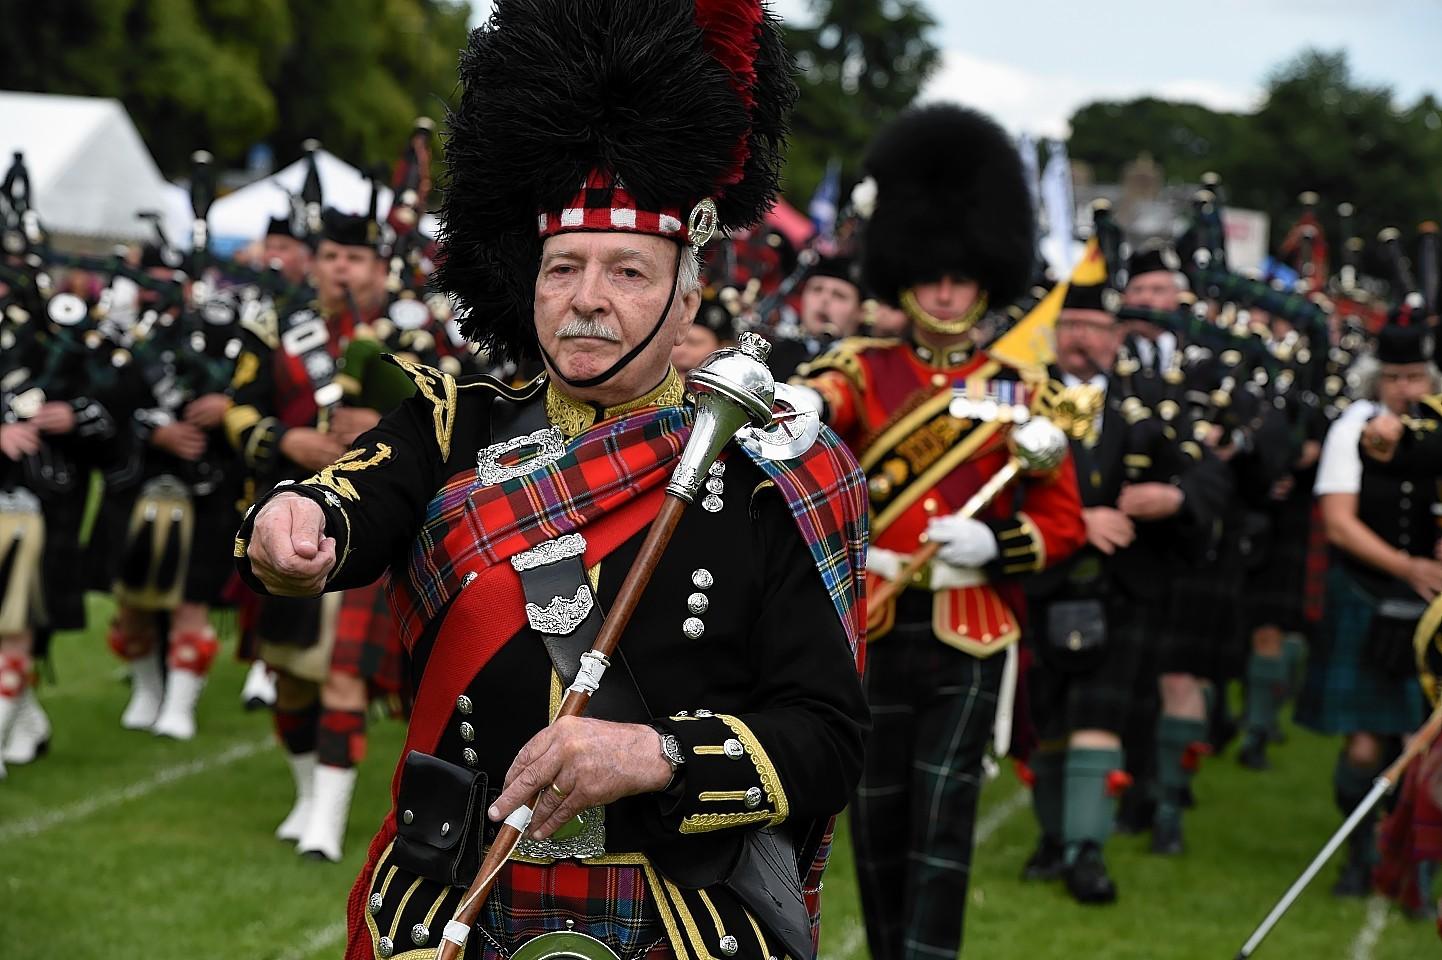 Massed pipe bands at Aboyne Highland Games. Credit: Kenny Elrick.